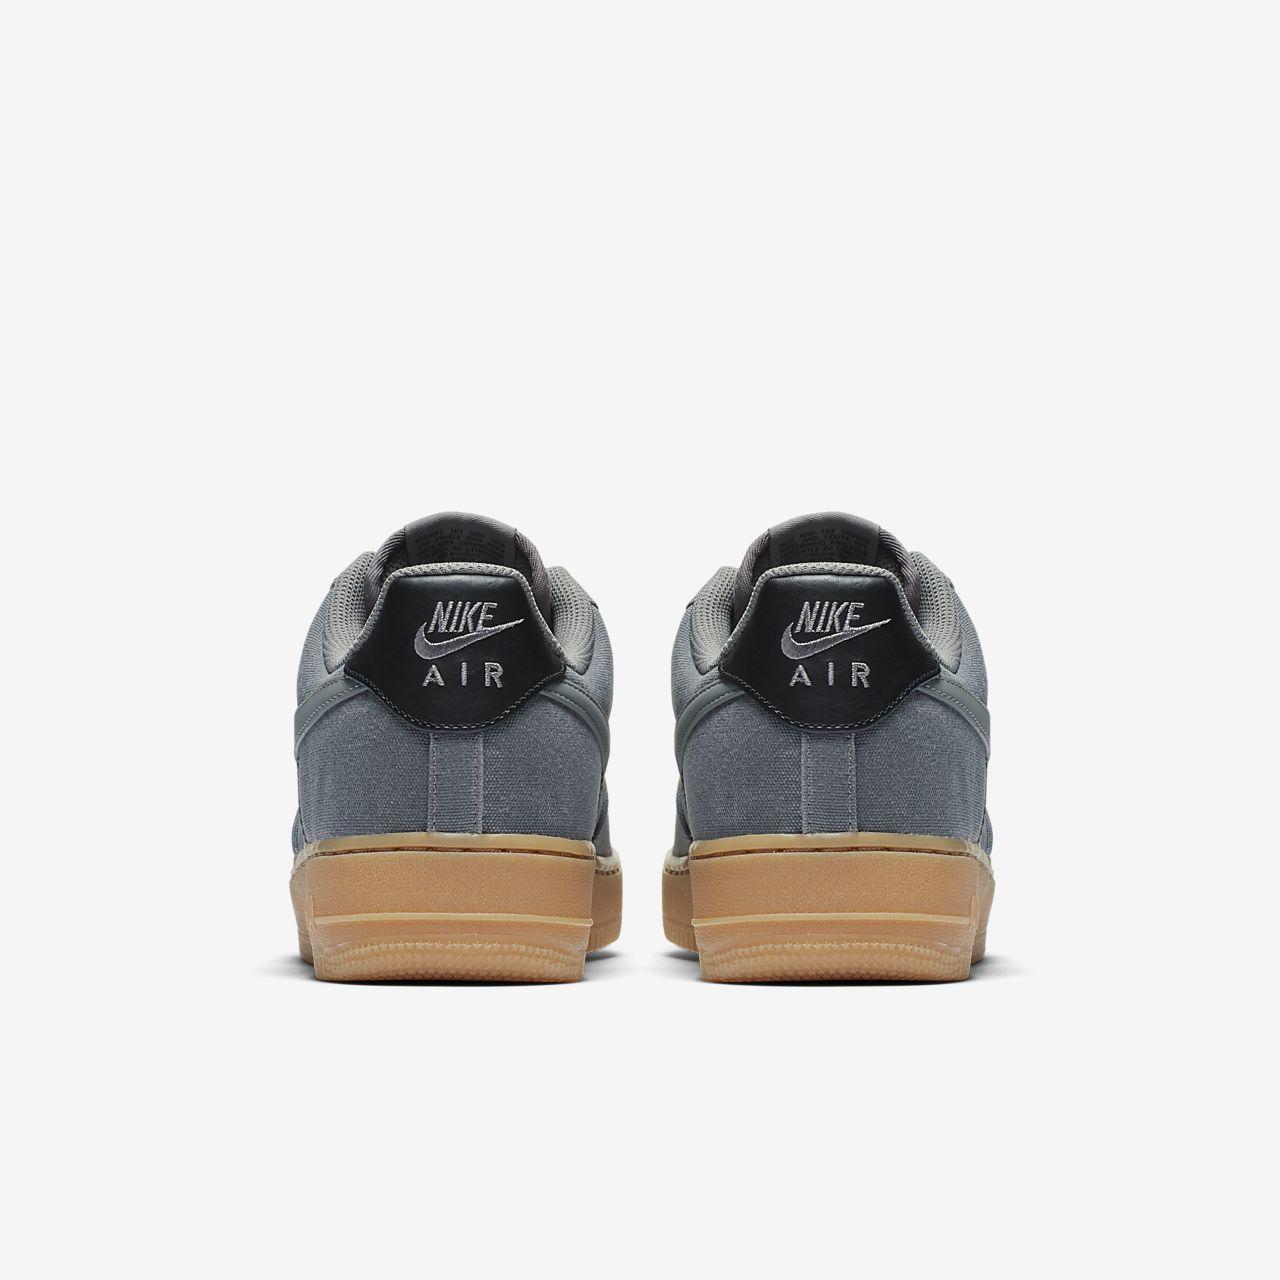 best service b52ca 98cb8 ... Nike Air Force 1  07 LV8 Style Men s Shoe